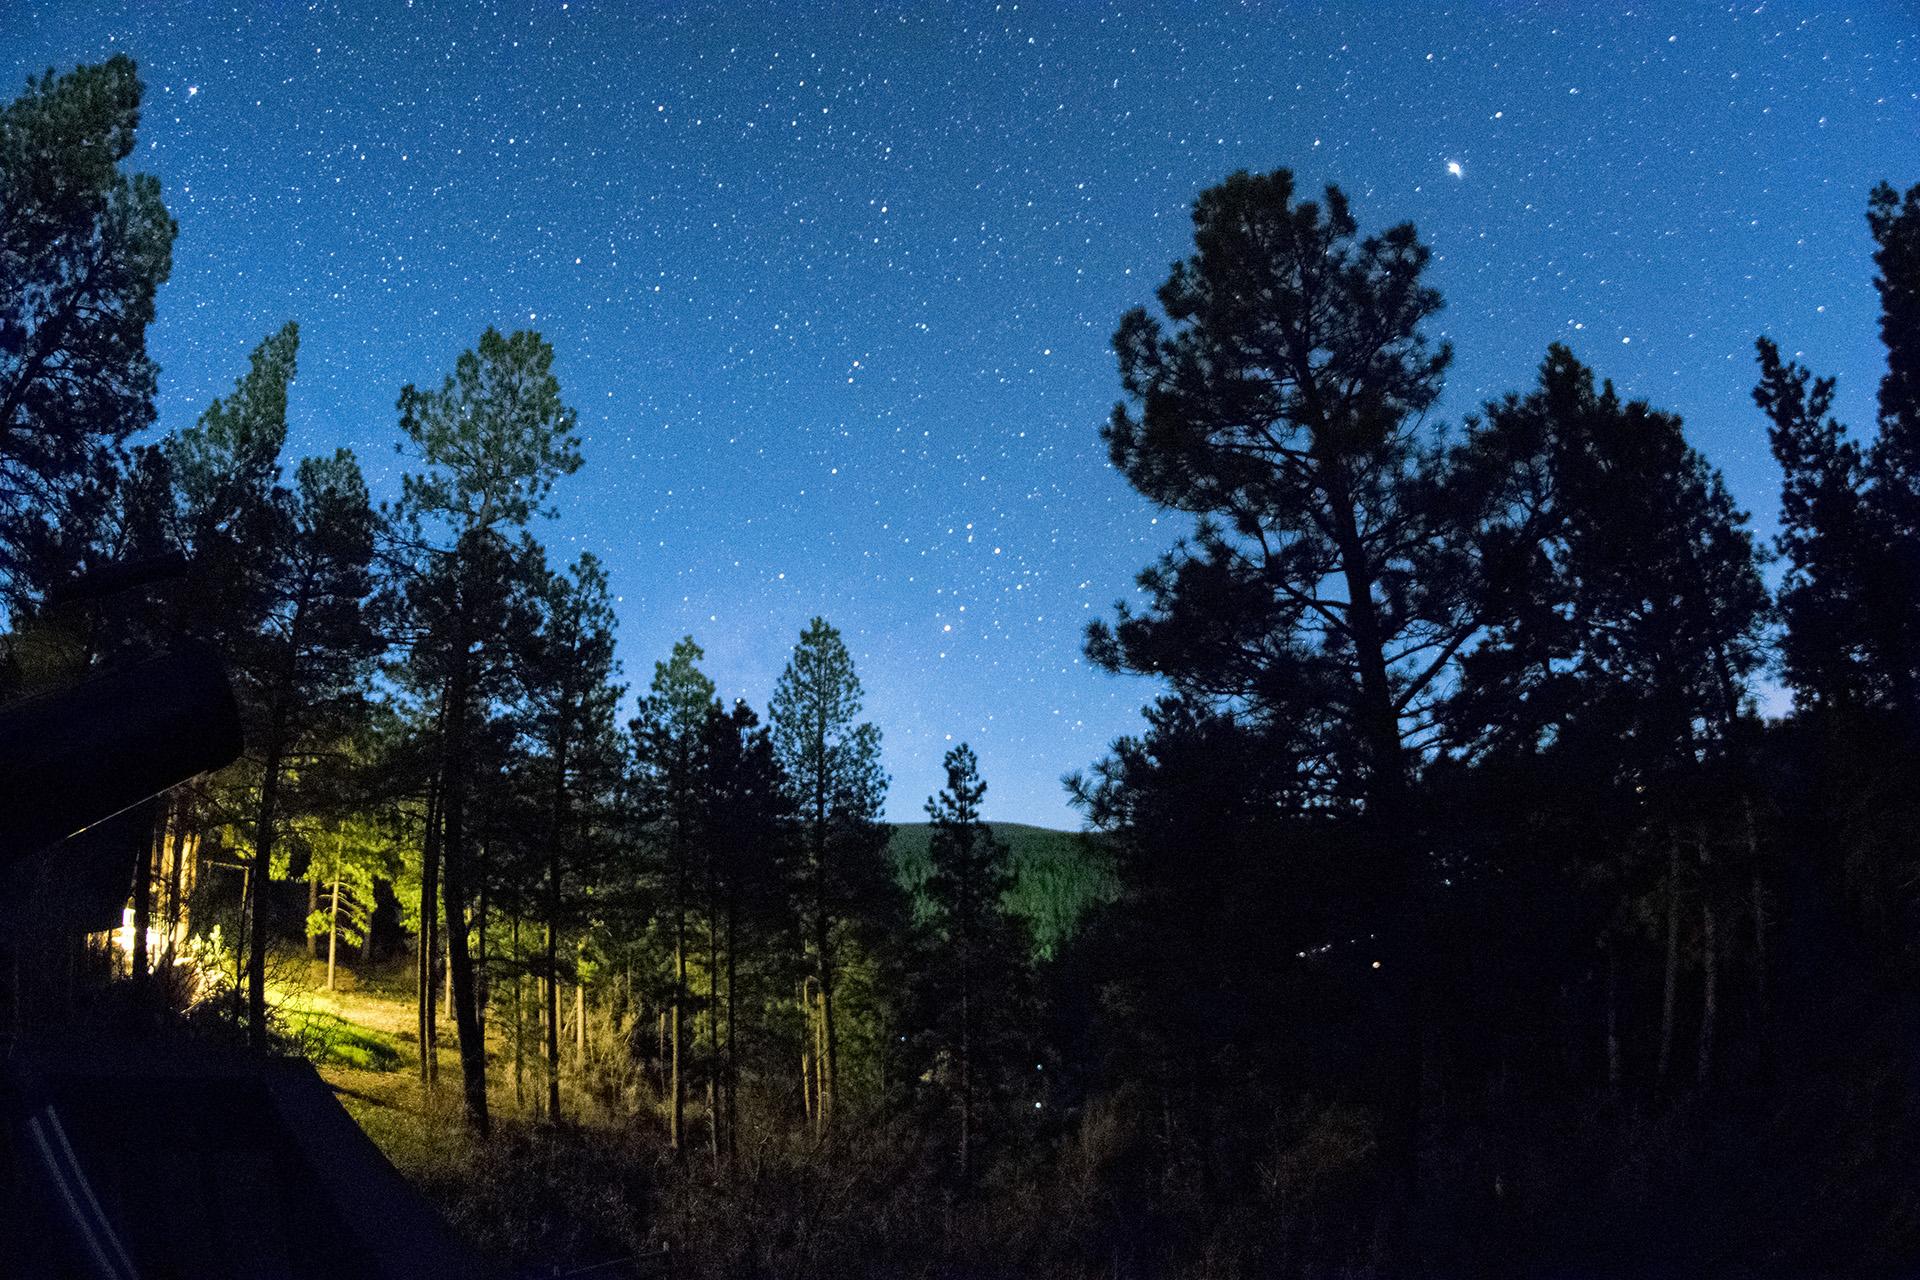 alpine nighttime deck shot.jpg